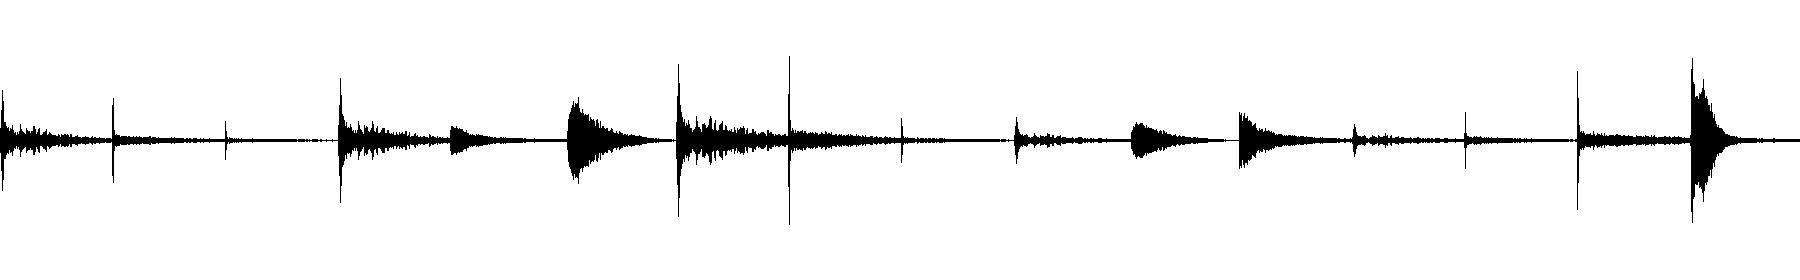 g abs05 074